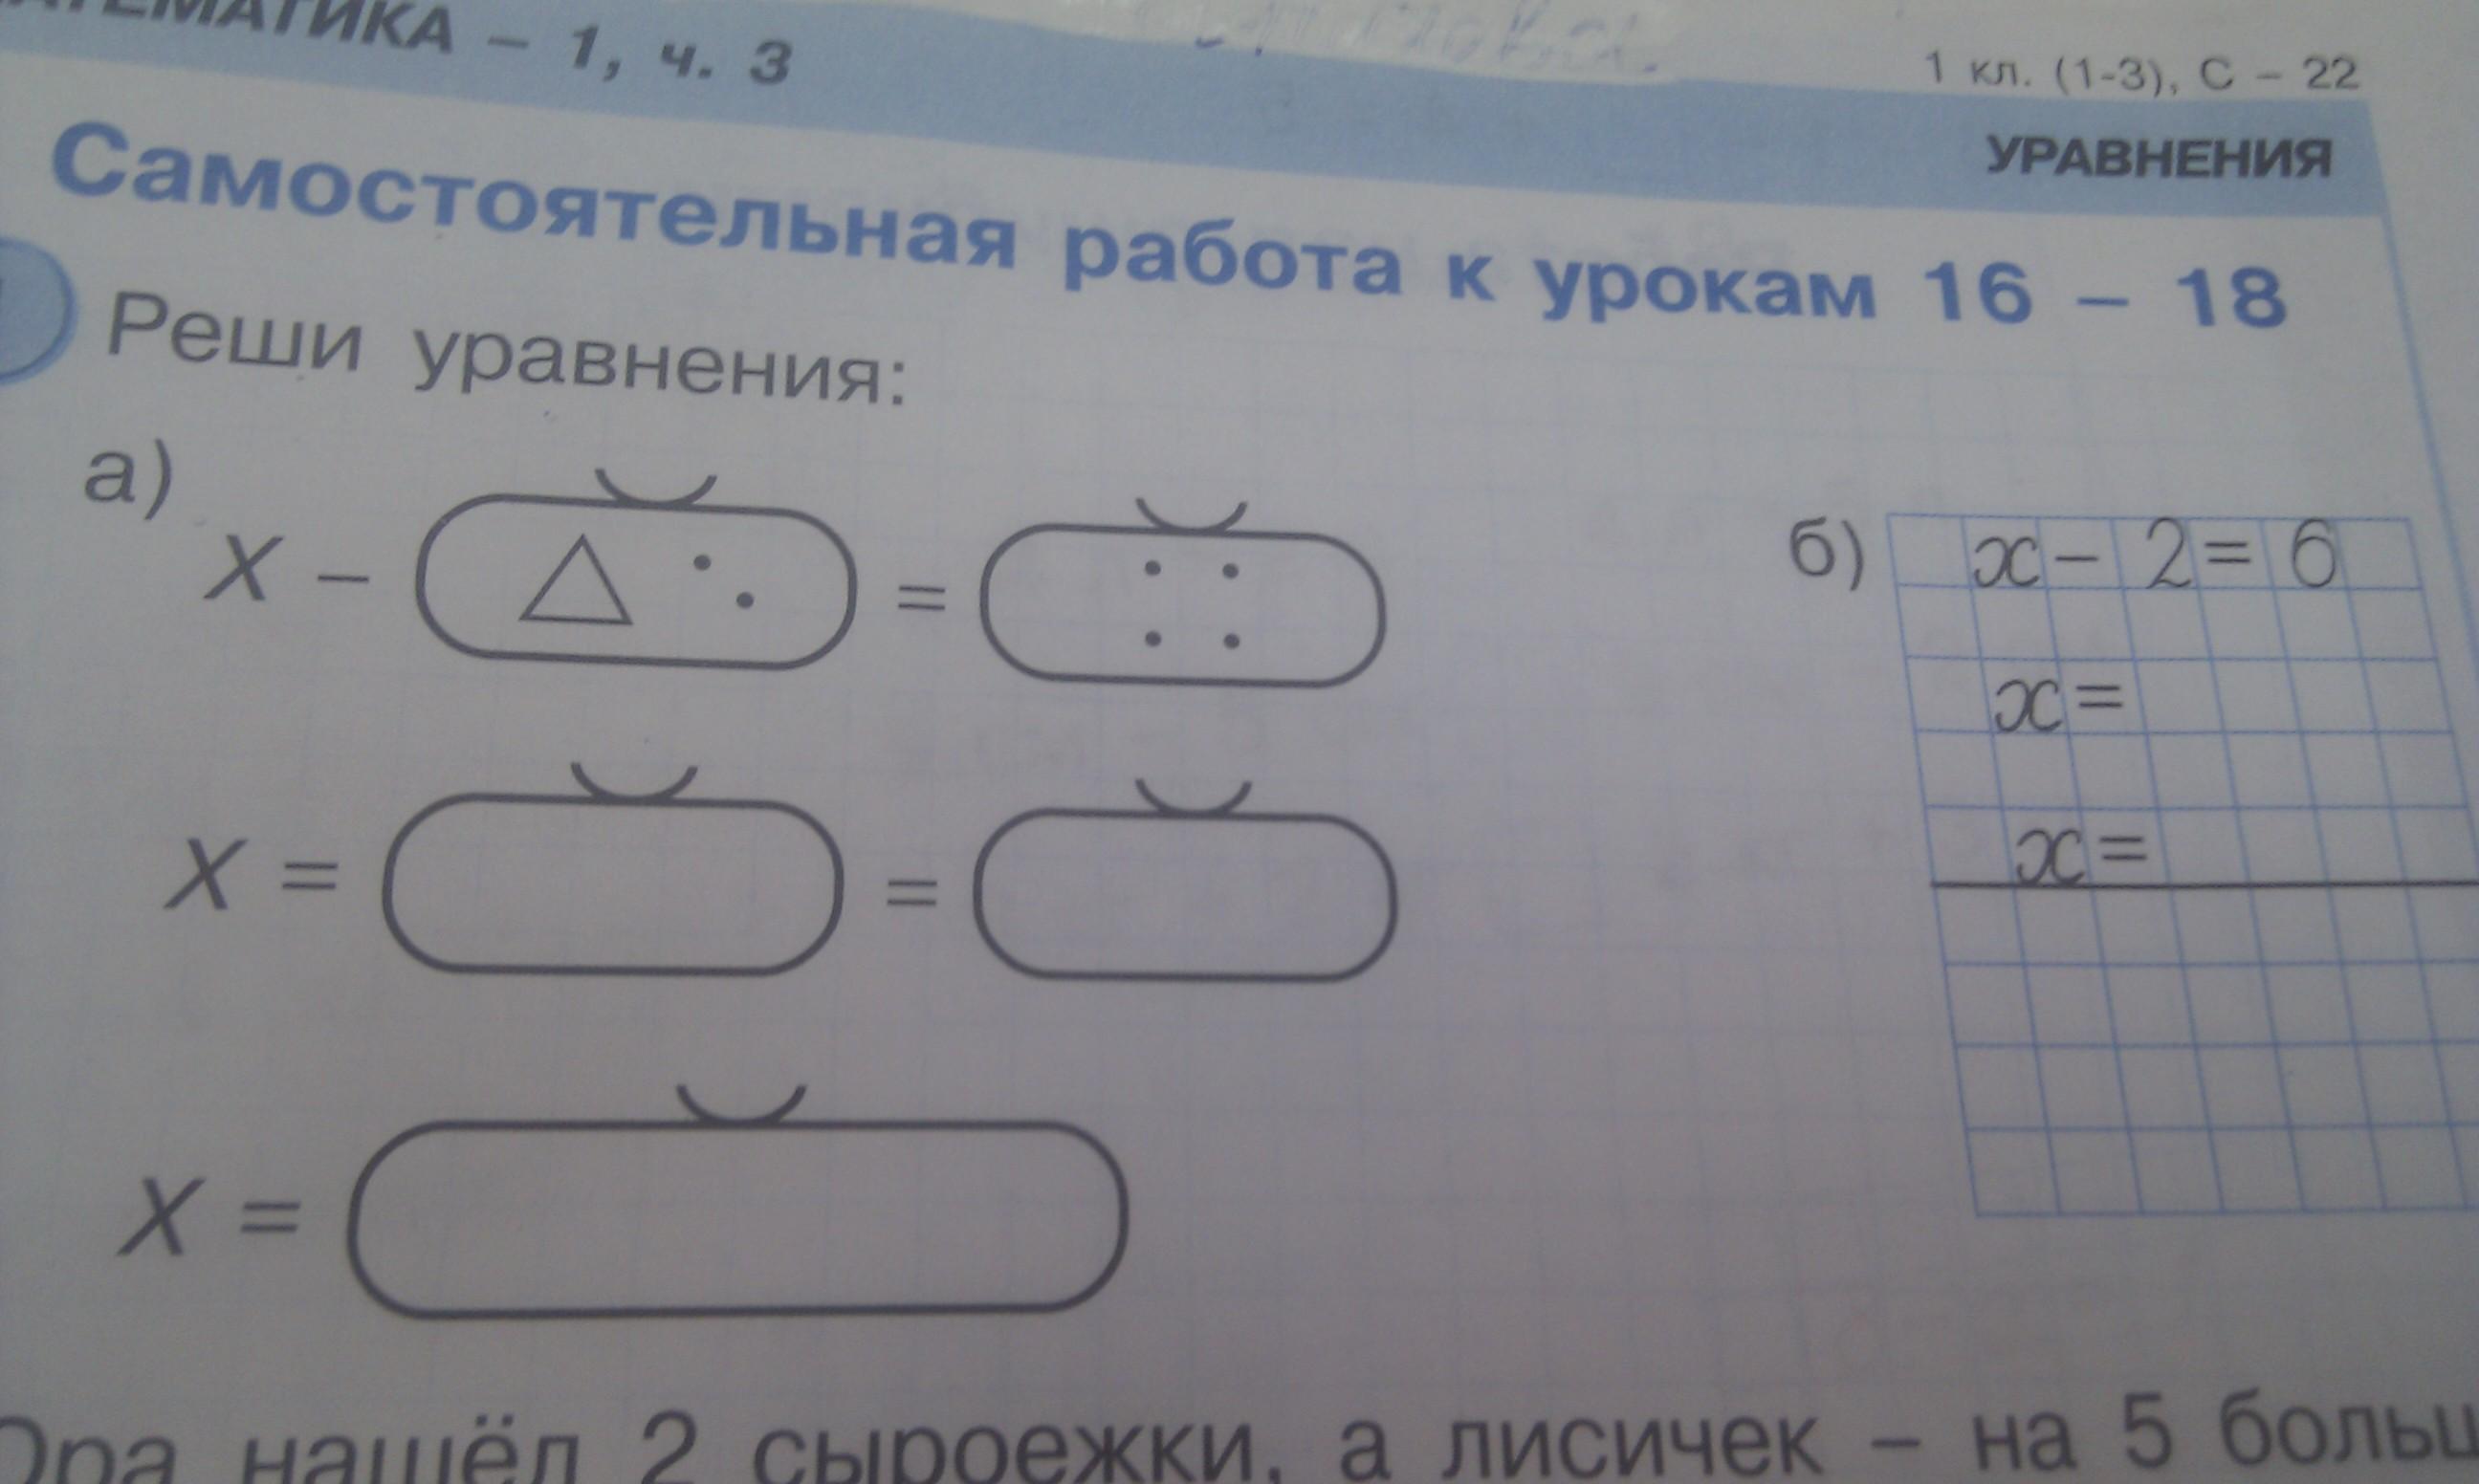 http://www.pictureshack.ru/images/4105IMAG0212.jpg